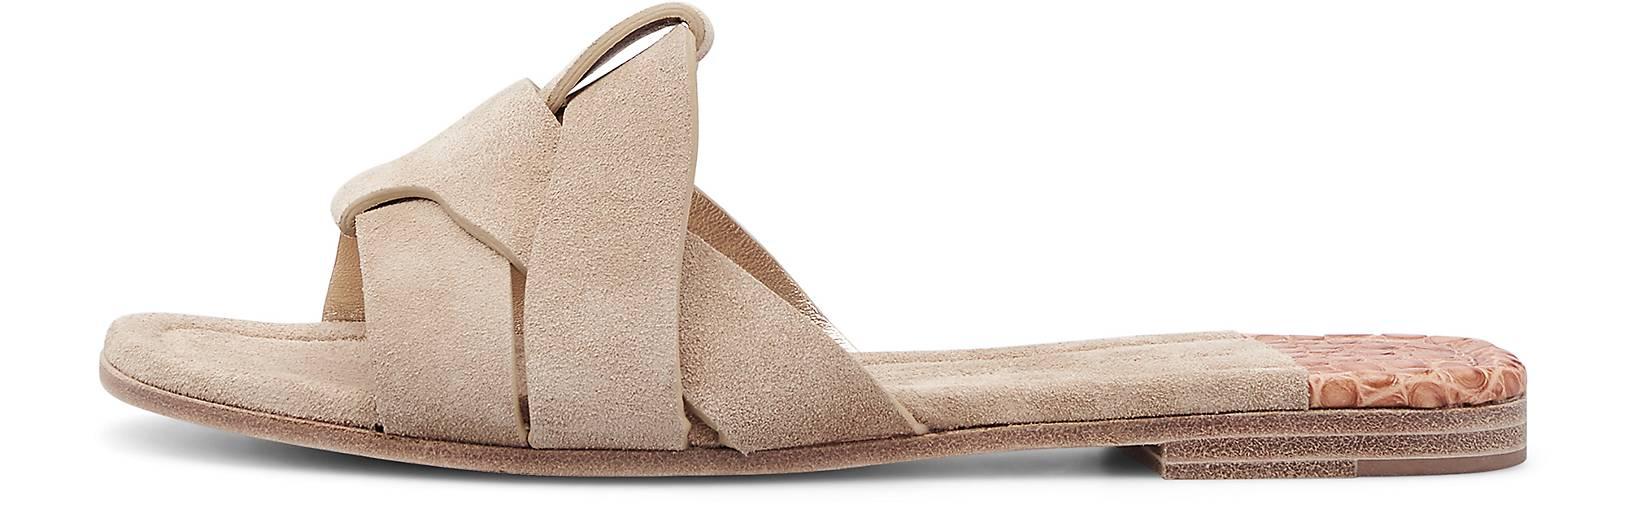 Kennel & Schmenger Trend-Pantolette JORDAN